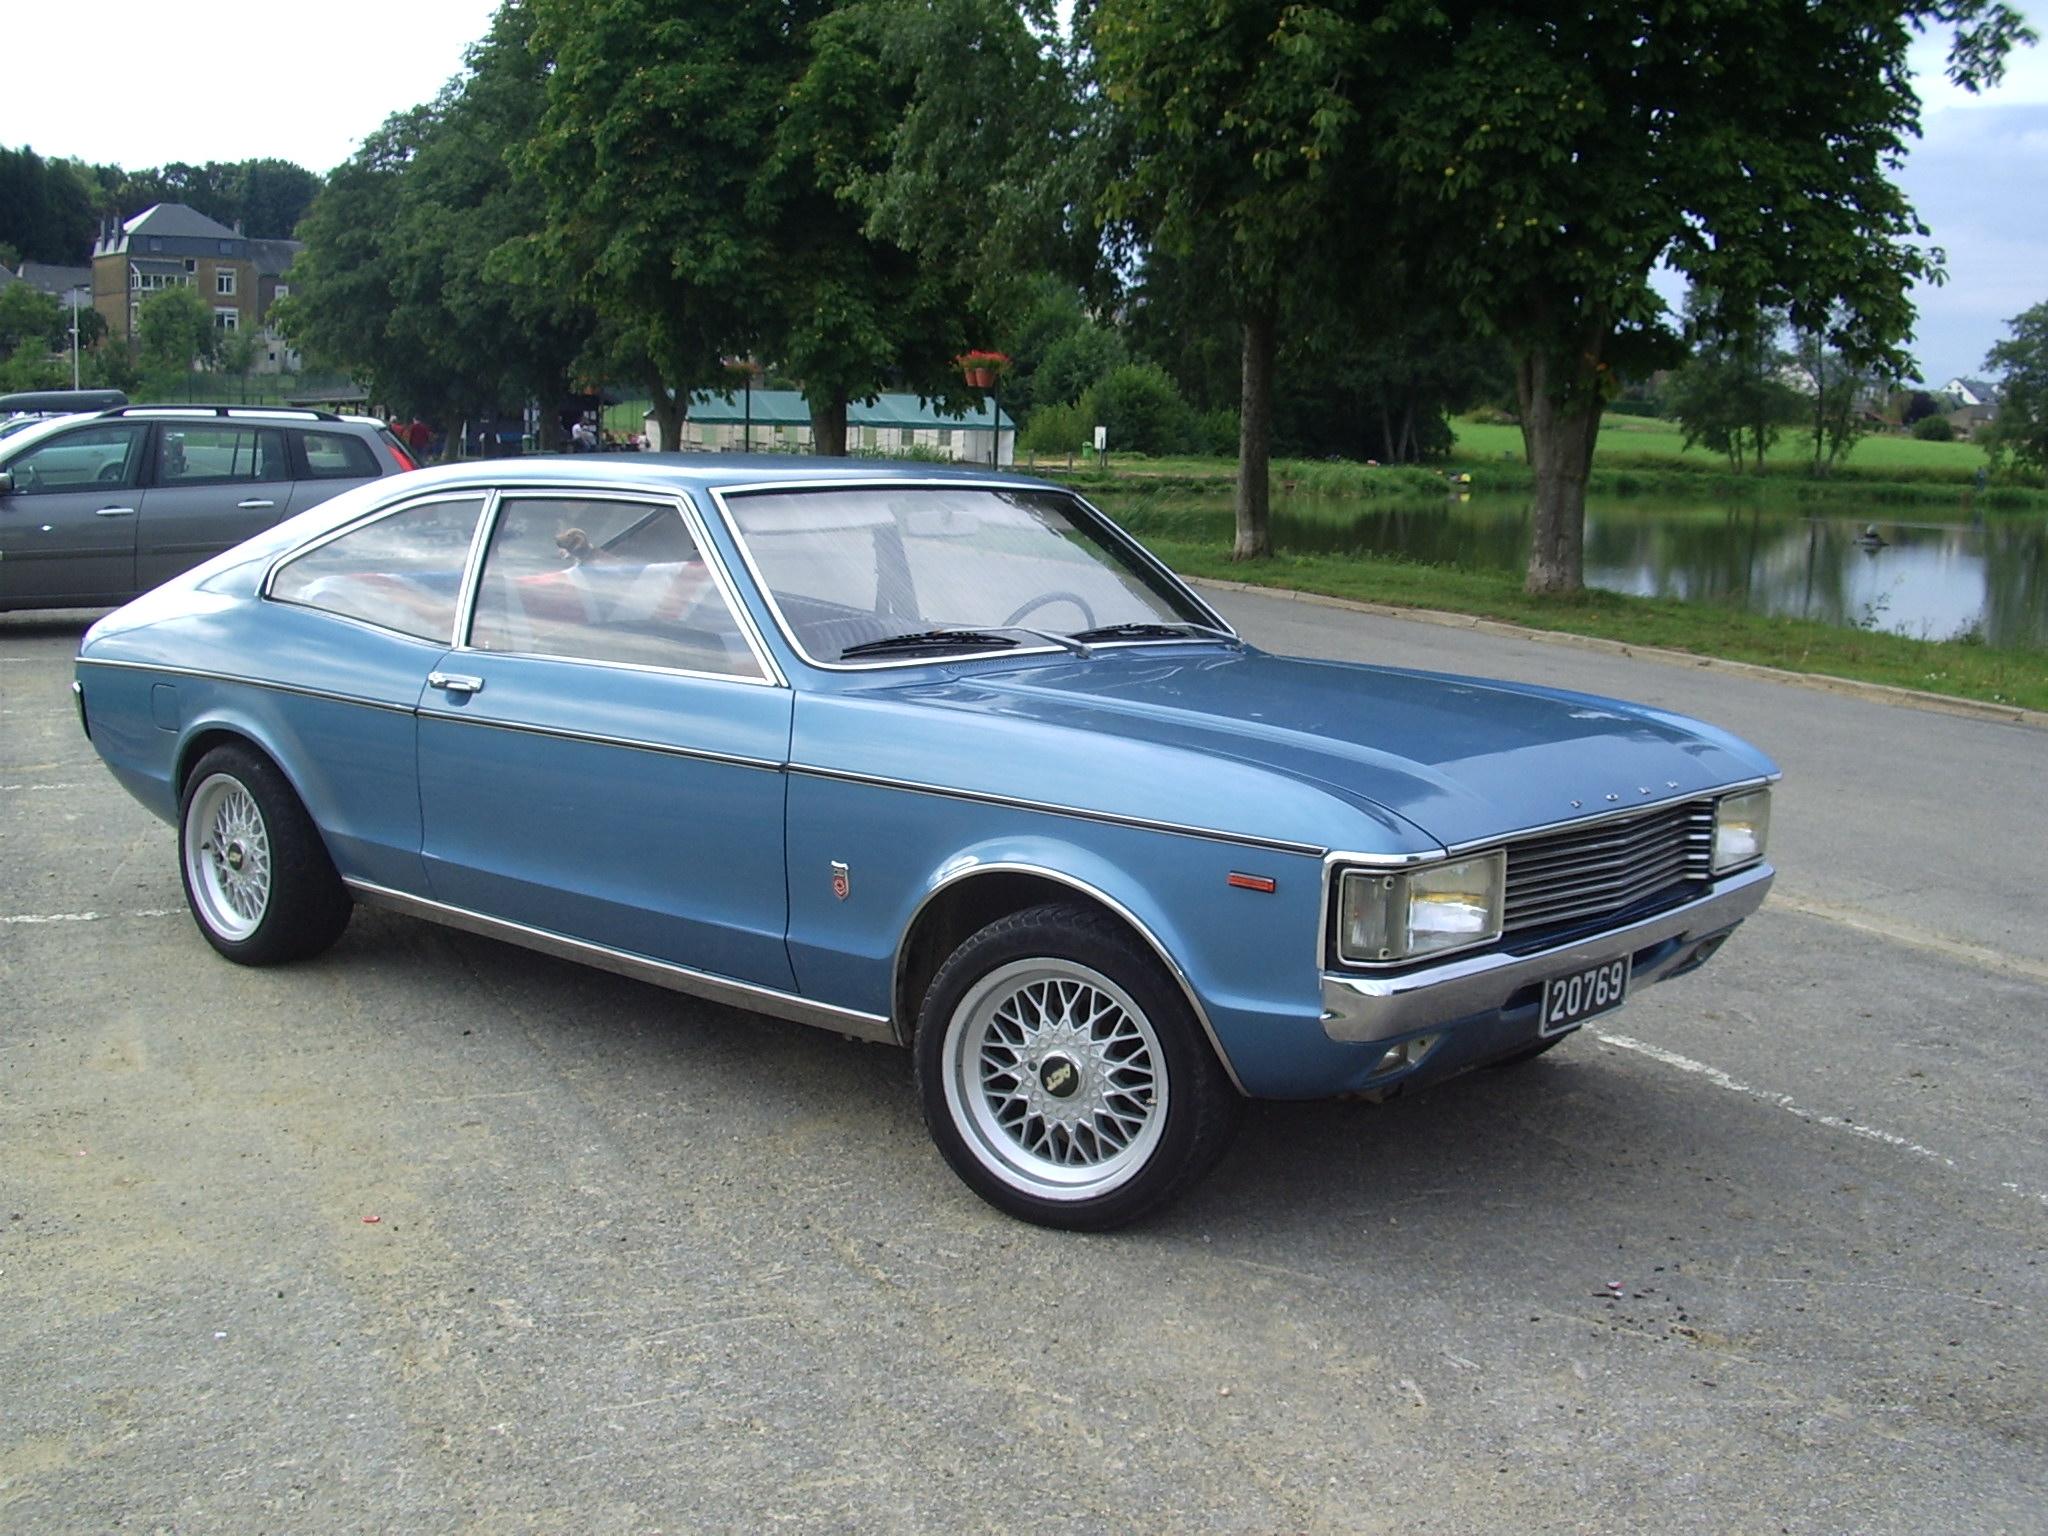 Ford Granada für reeles